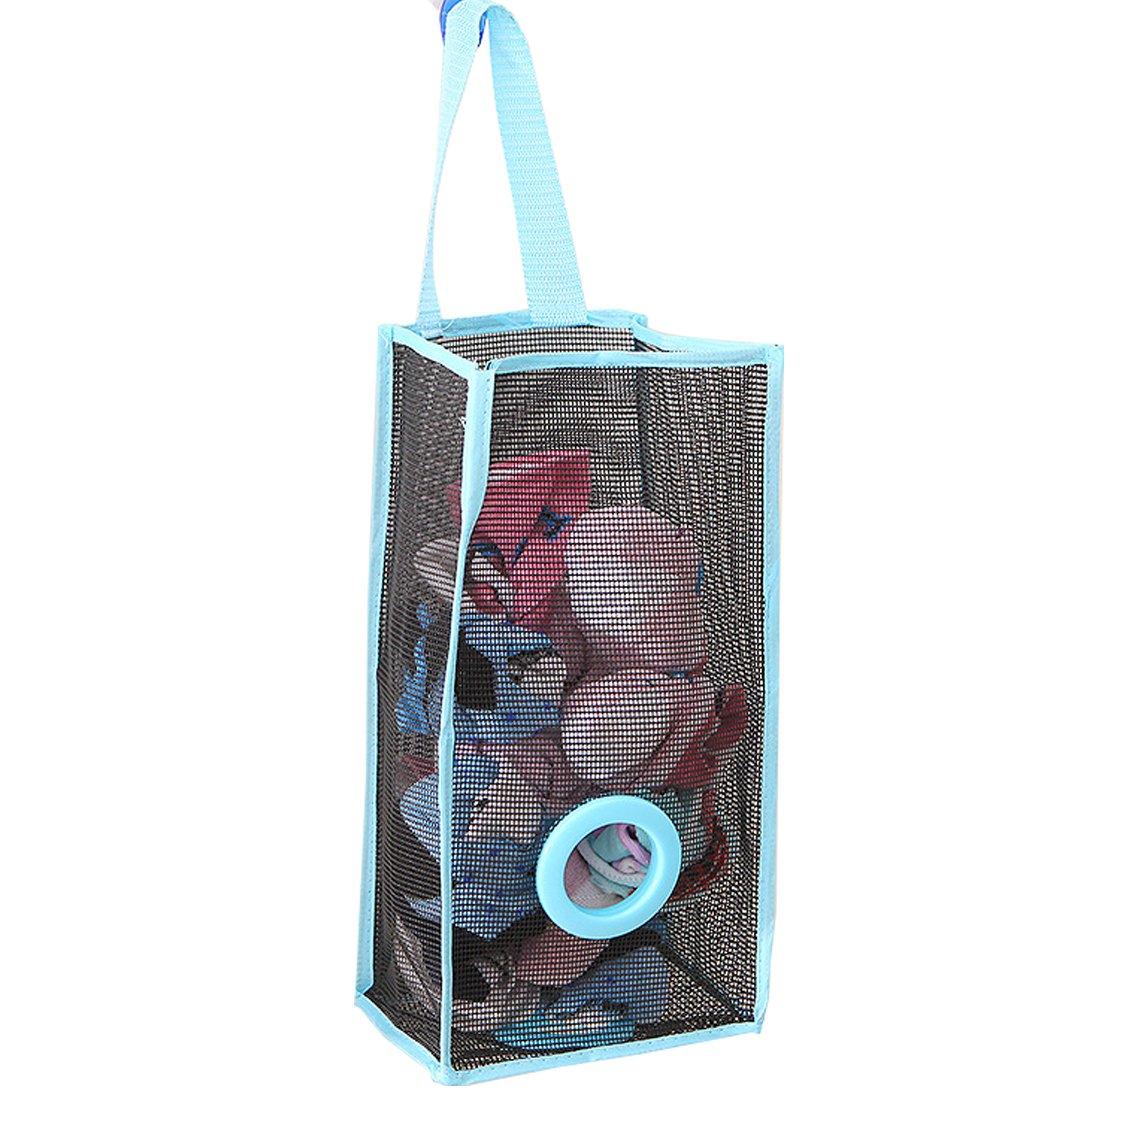 Eworld Breathable Mesh Storage Bag Dispenser Hanging Grocery Bag Container Plastic Reusable Garbage Bag Saver Organizer Wall Mount Plastic Bag Holder for Kitchen Bathroom Office (Medium, Blue)